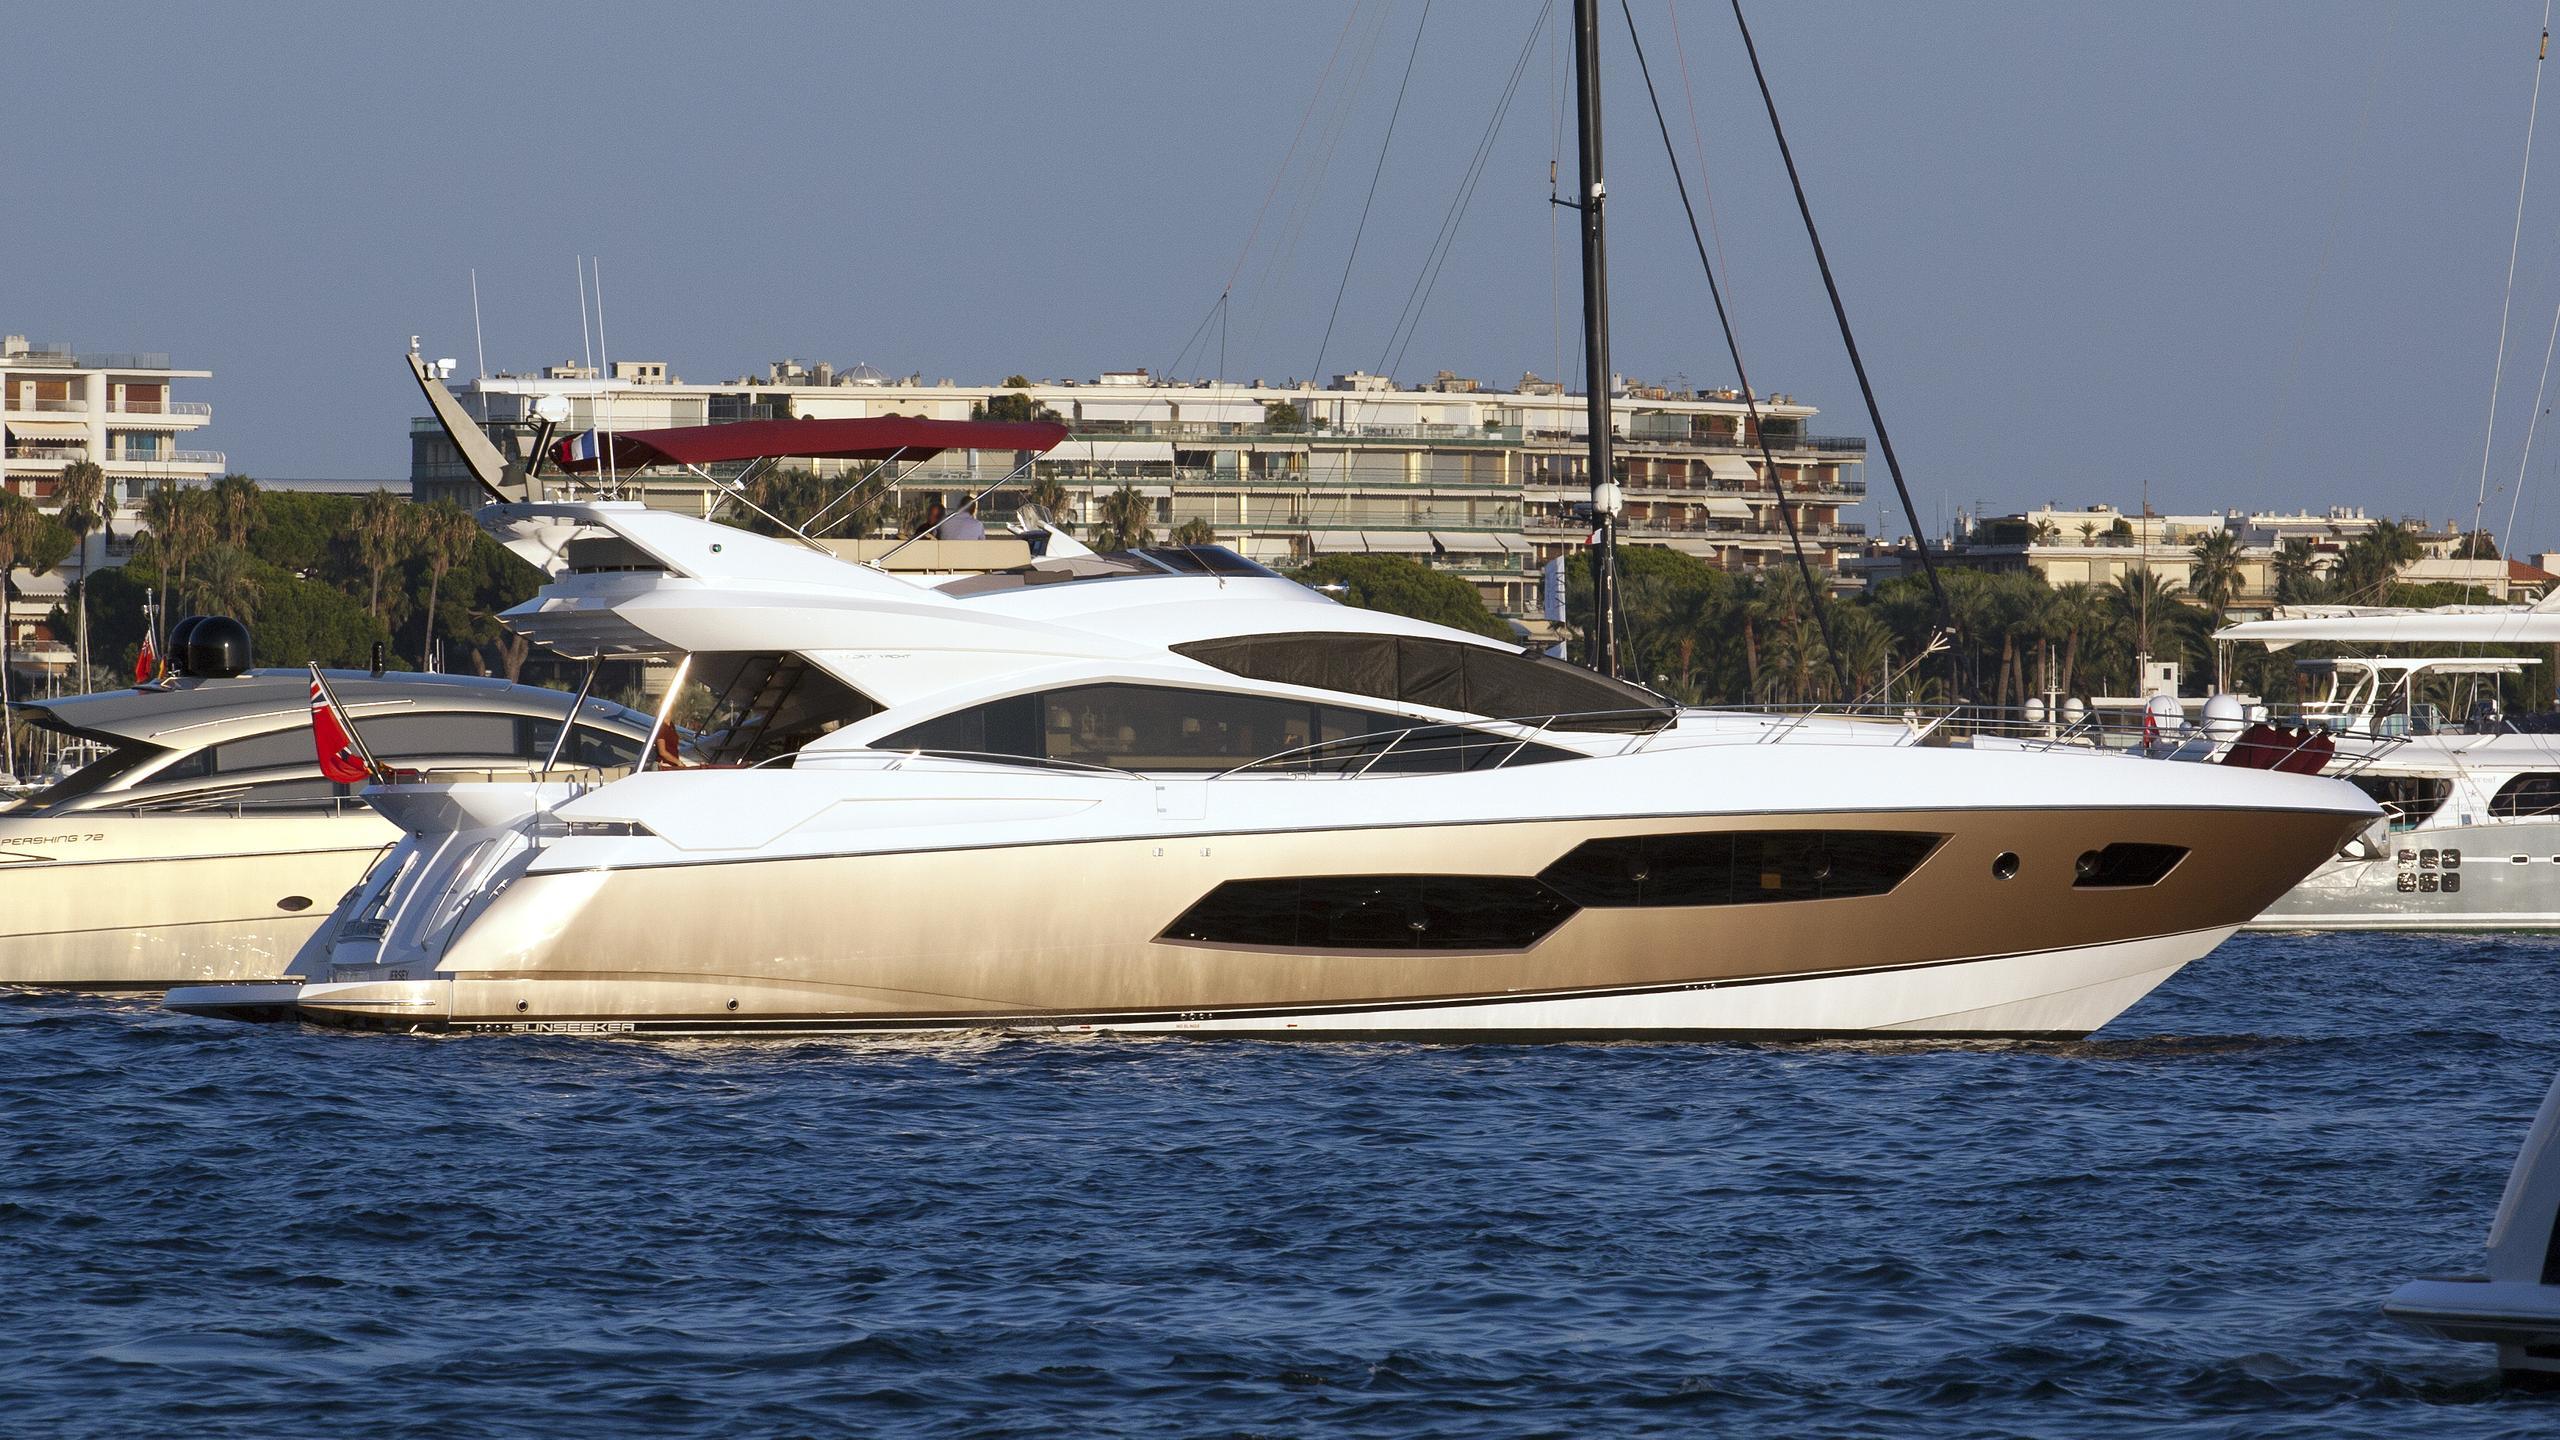 harmony-motor-yacht-sunseeker-80-2014-25m-profile